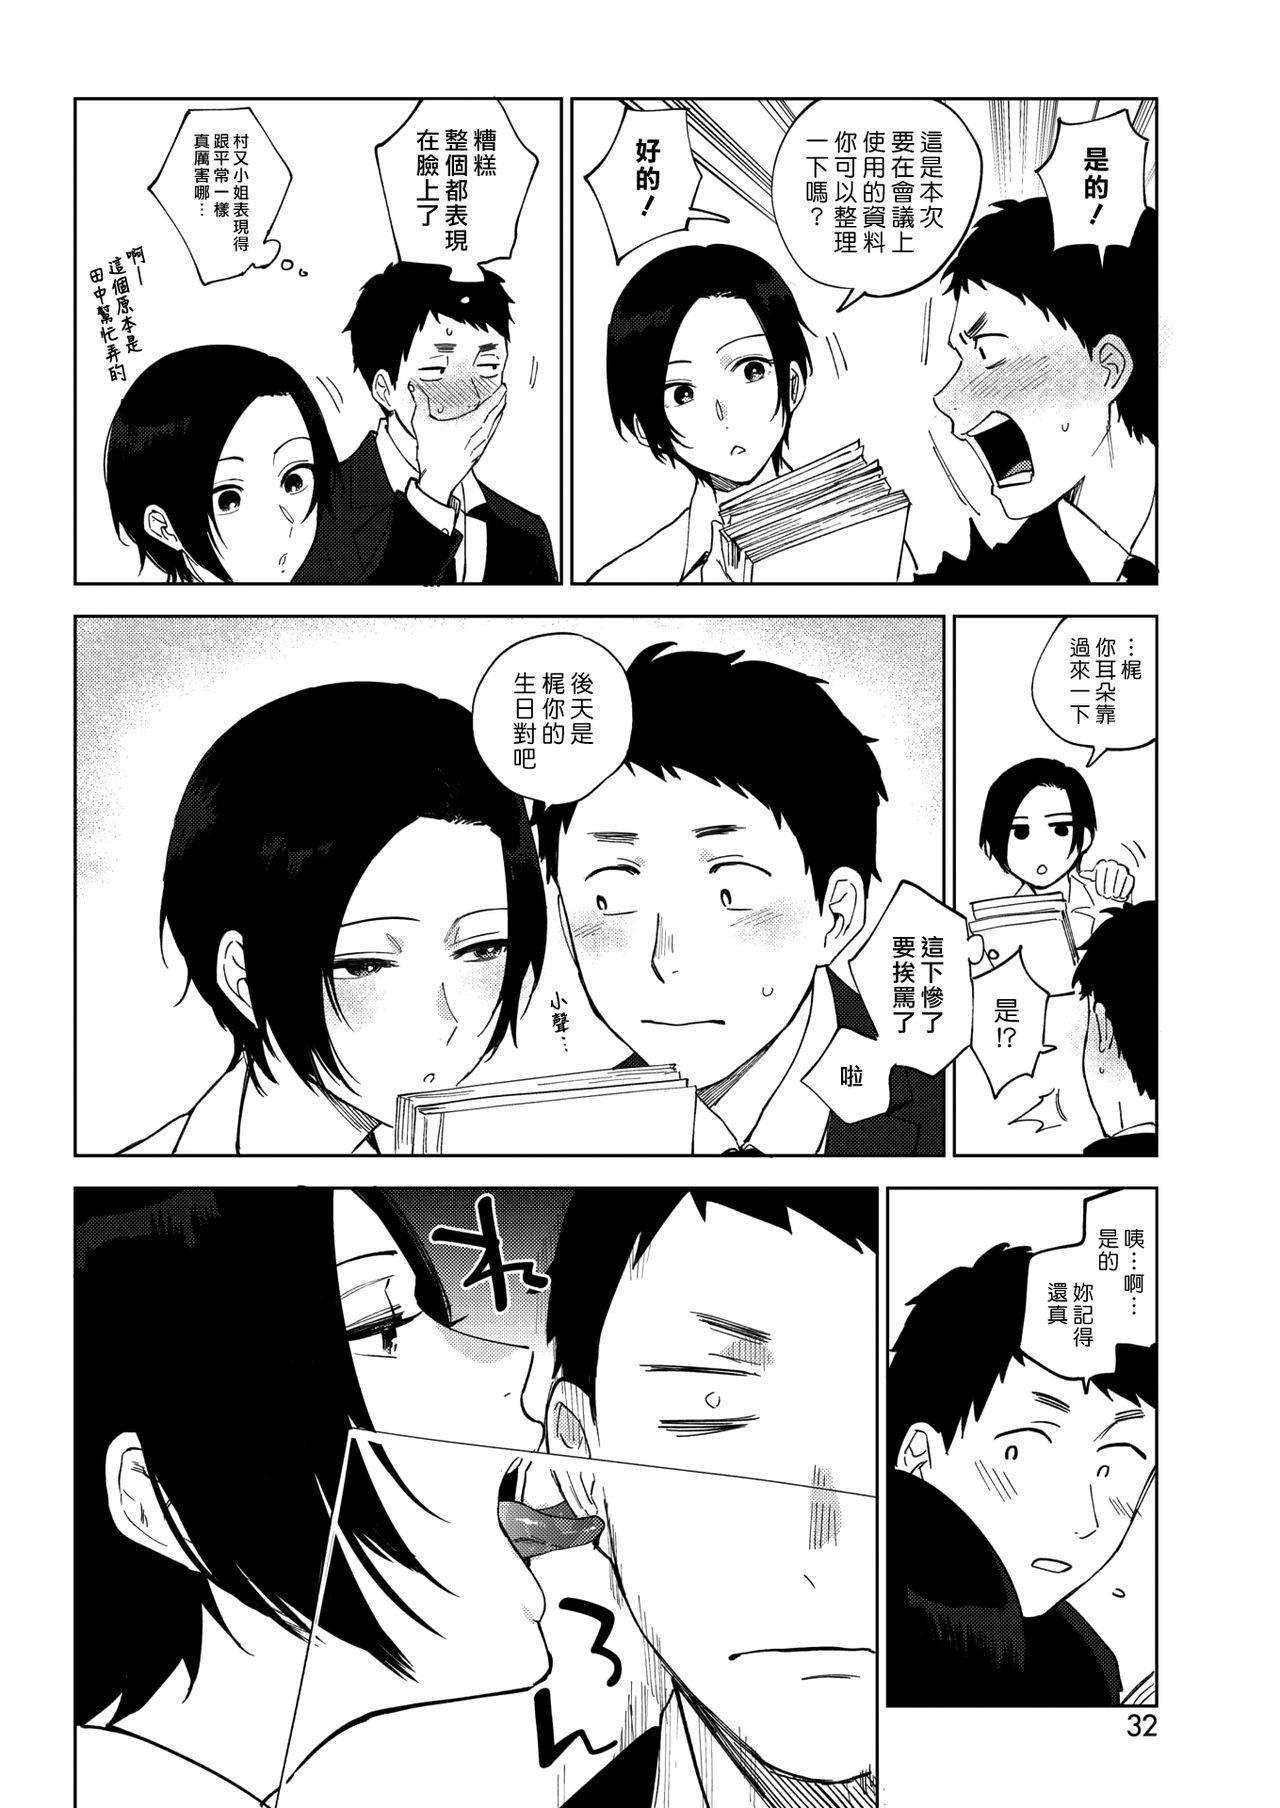 Muramata-san no Himitsu 2 | 村又小姐的秘密 2 1